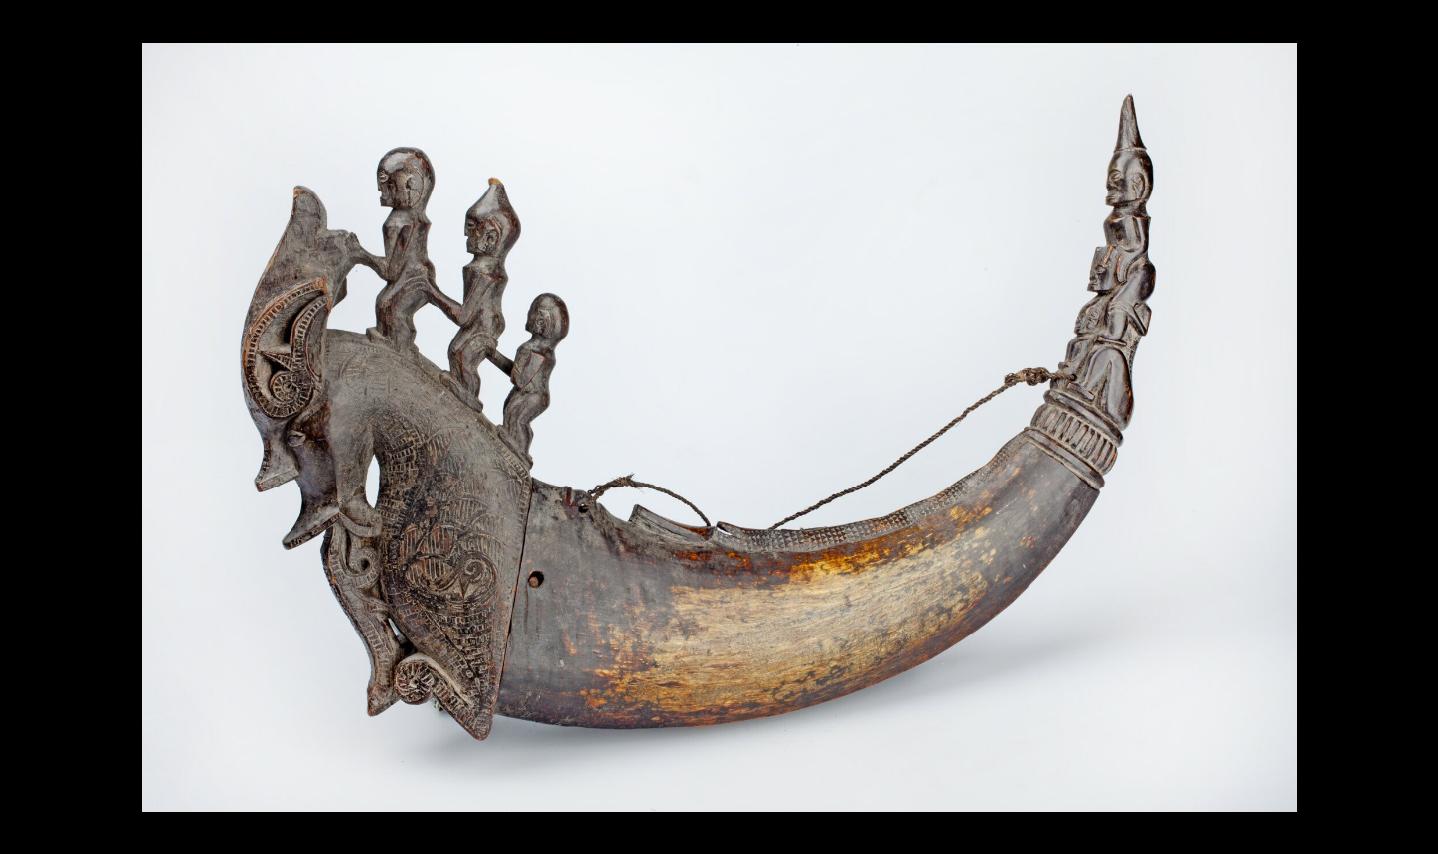 Priest's Container for Magical and Medicinal Paraphernalia |  Naga Morsarang  © Nationaal Museum van Wereldculturen | The Netherlands